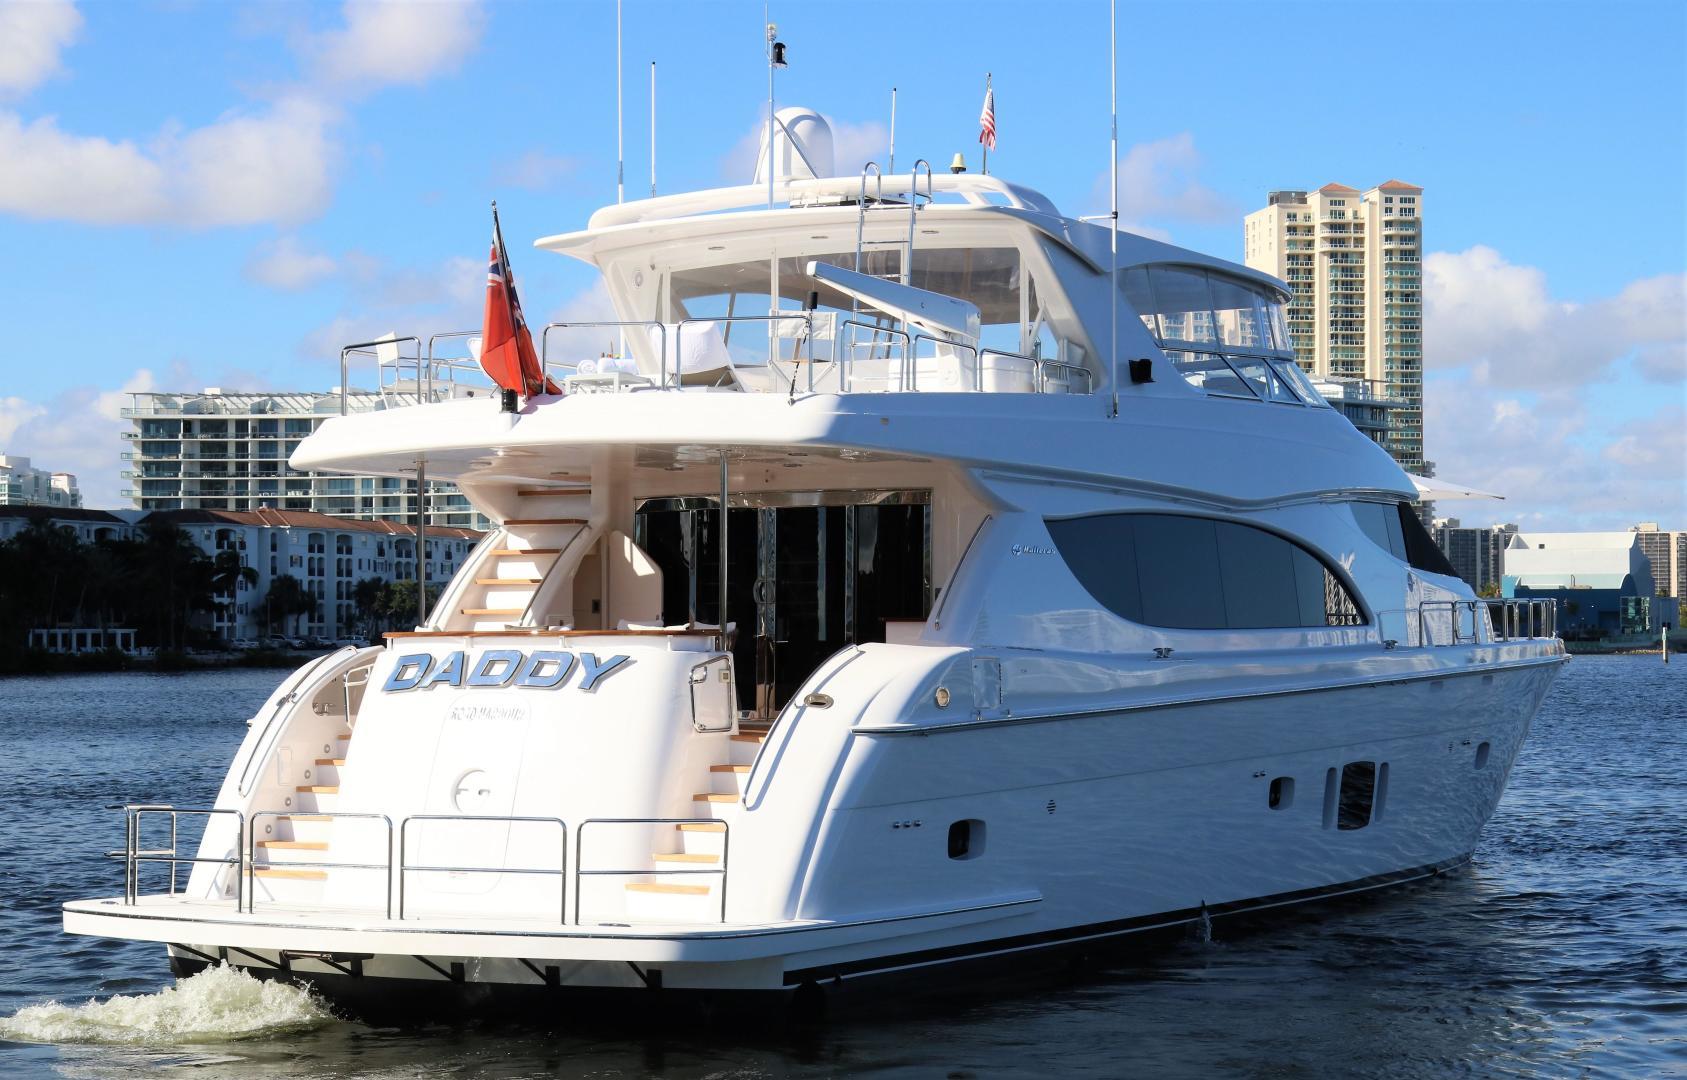 Hatteras-80 Motor Yacht 2015-Daddy Miami-Florida-United States-556323 | Thumbnail